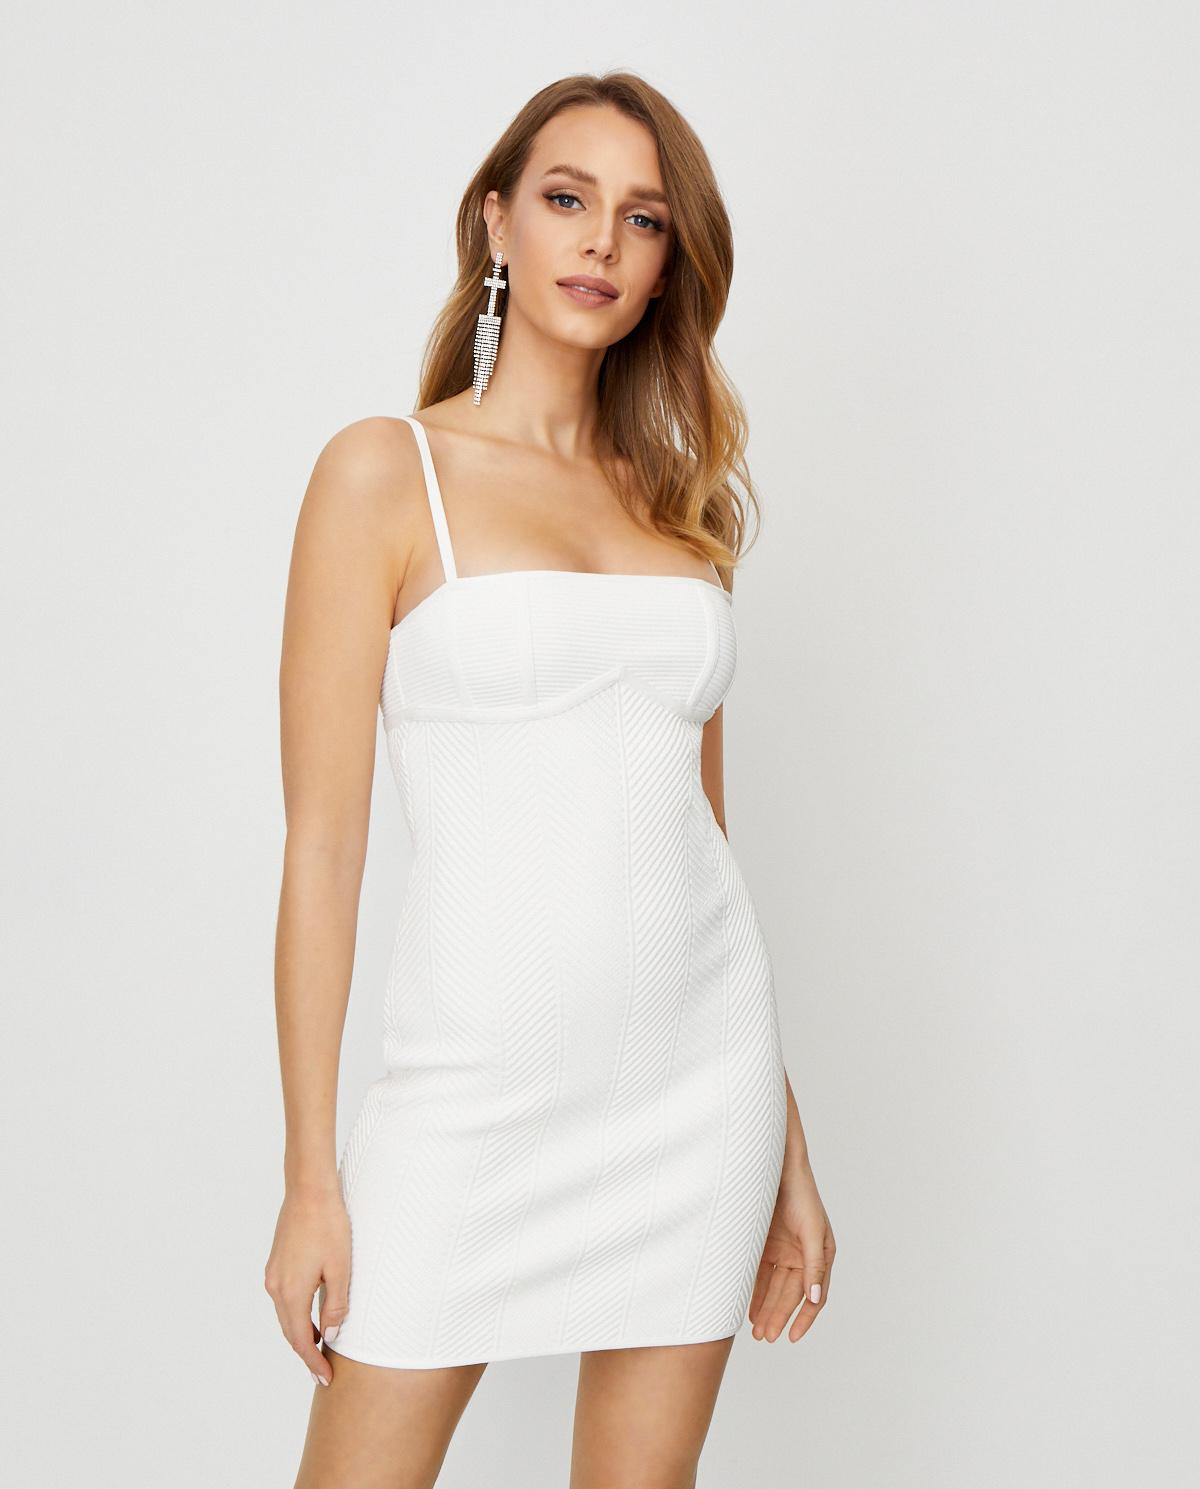 Biała sukienka na ramiączkach Herve Leger 46CNT8284834-902